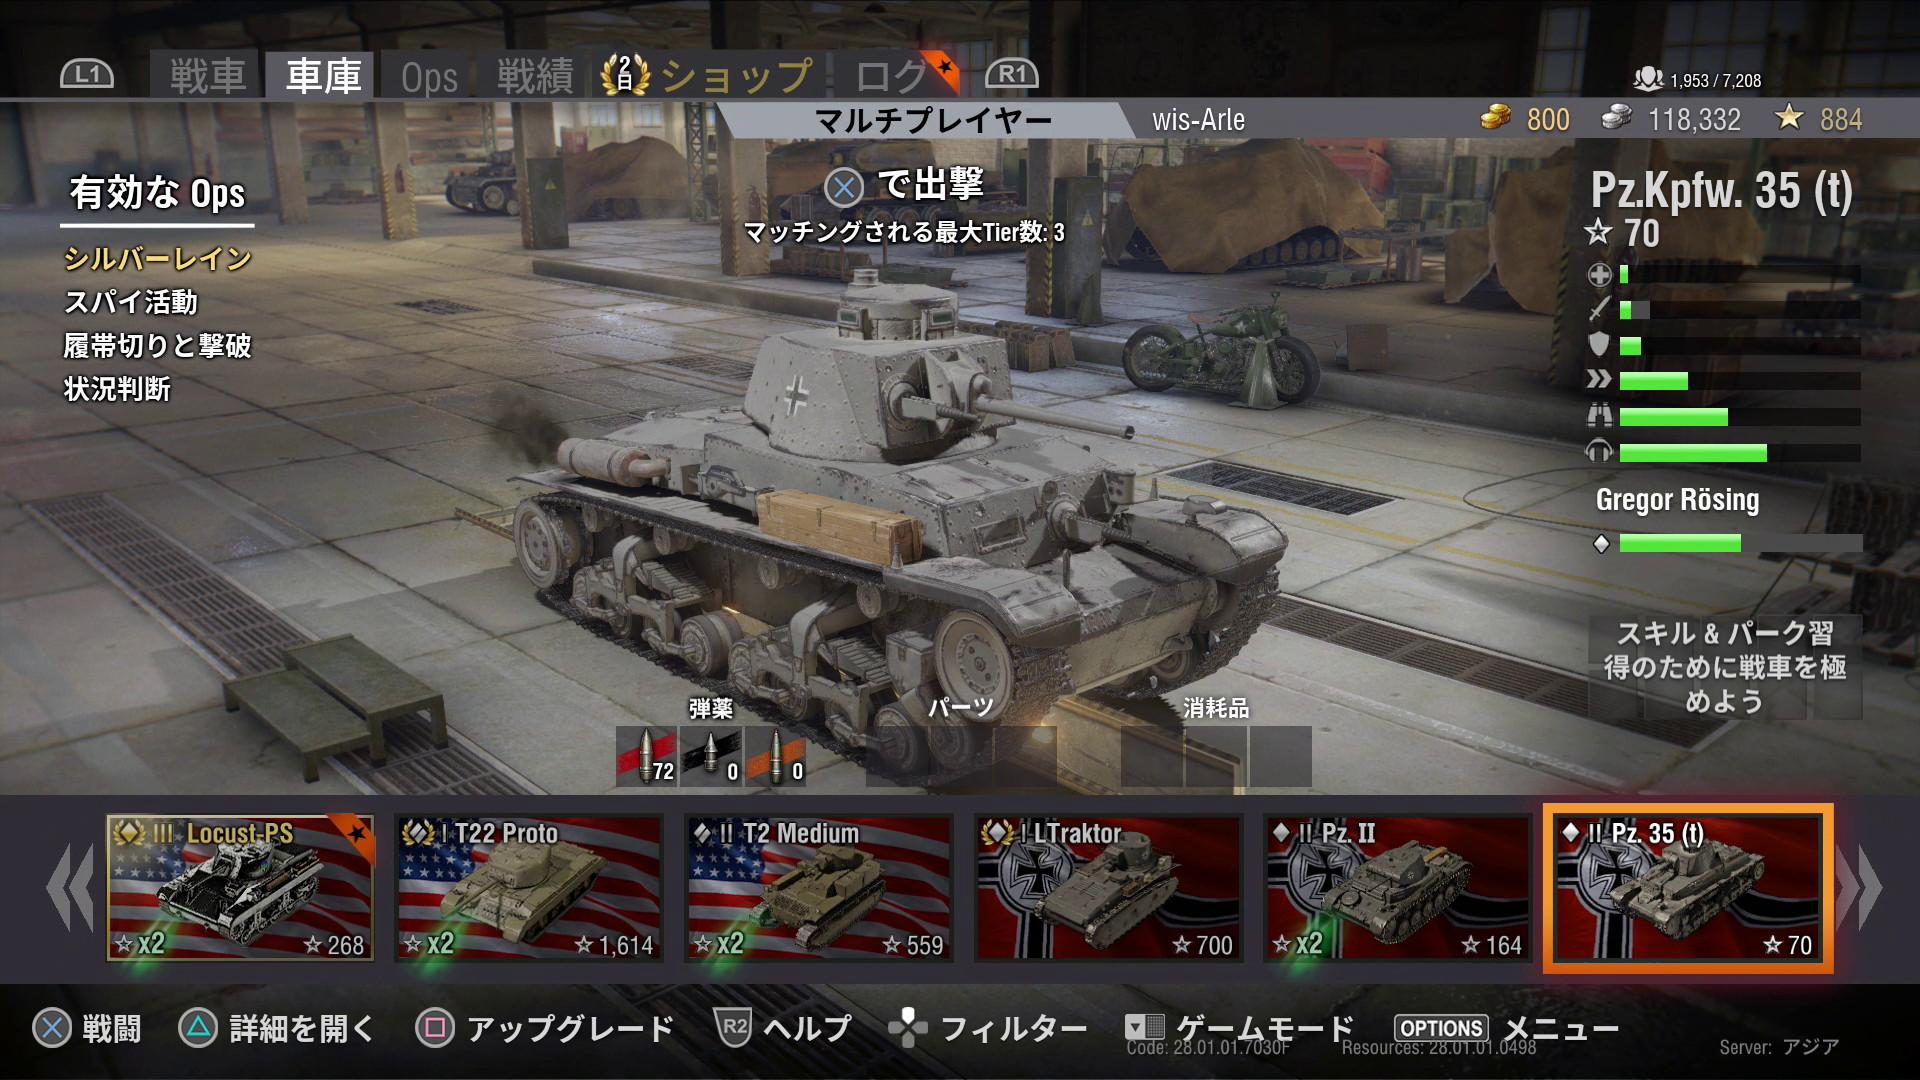 Tier2軽戦車「Pz.35(t)」